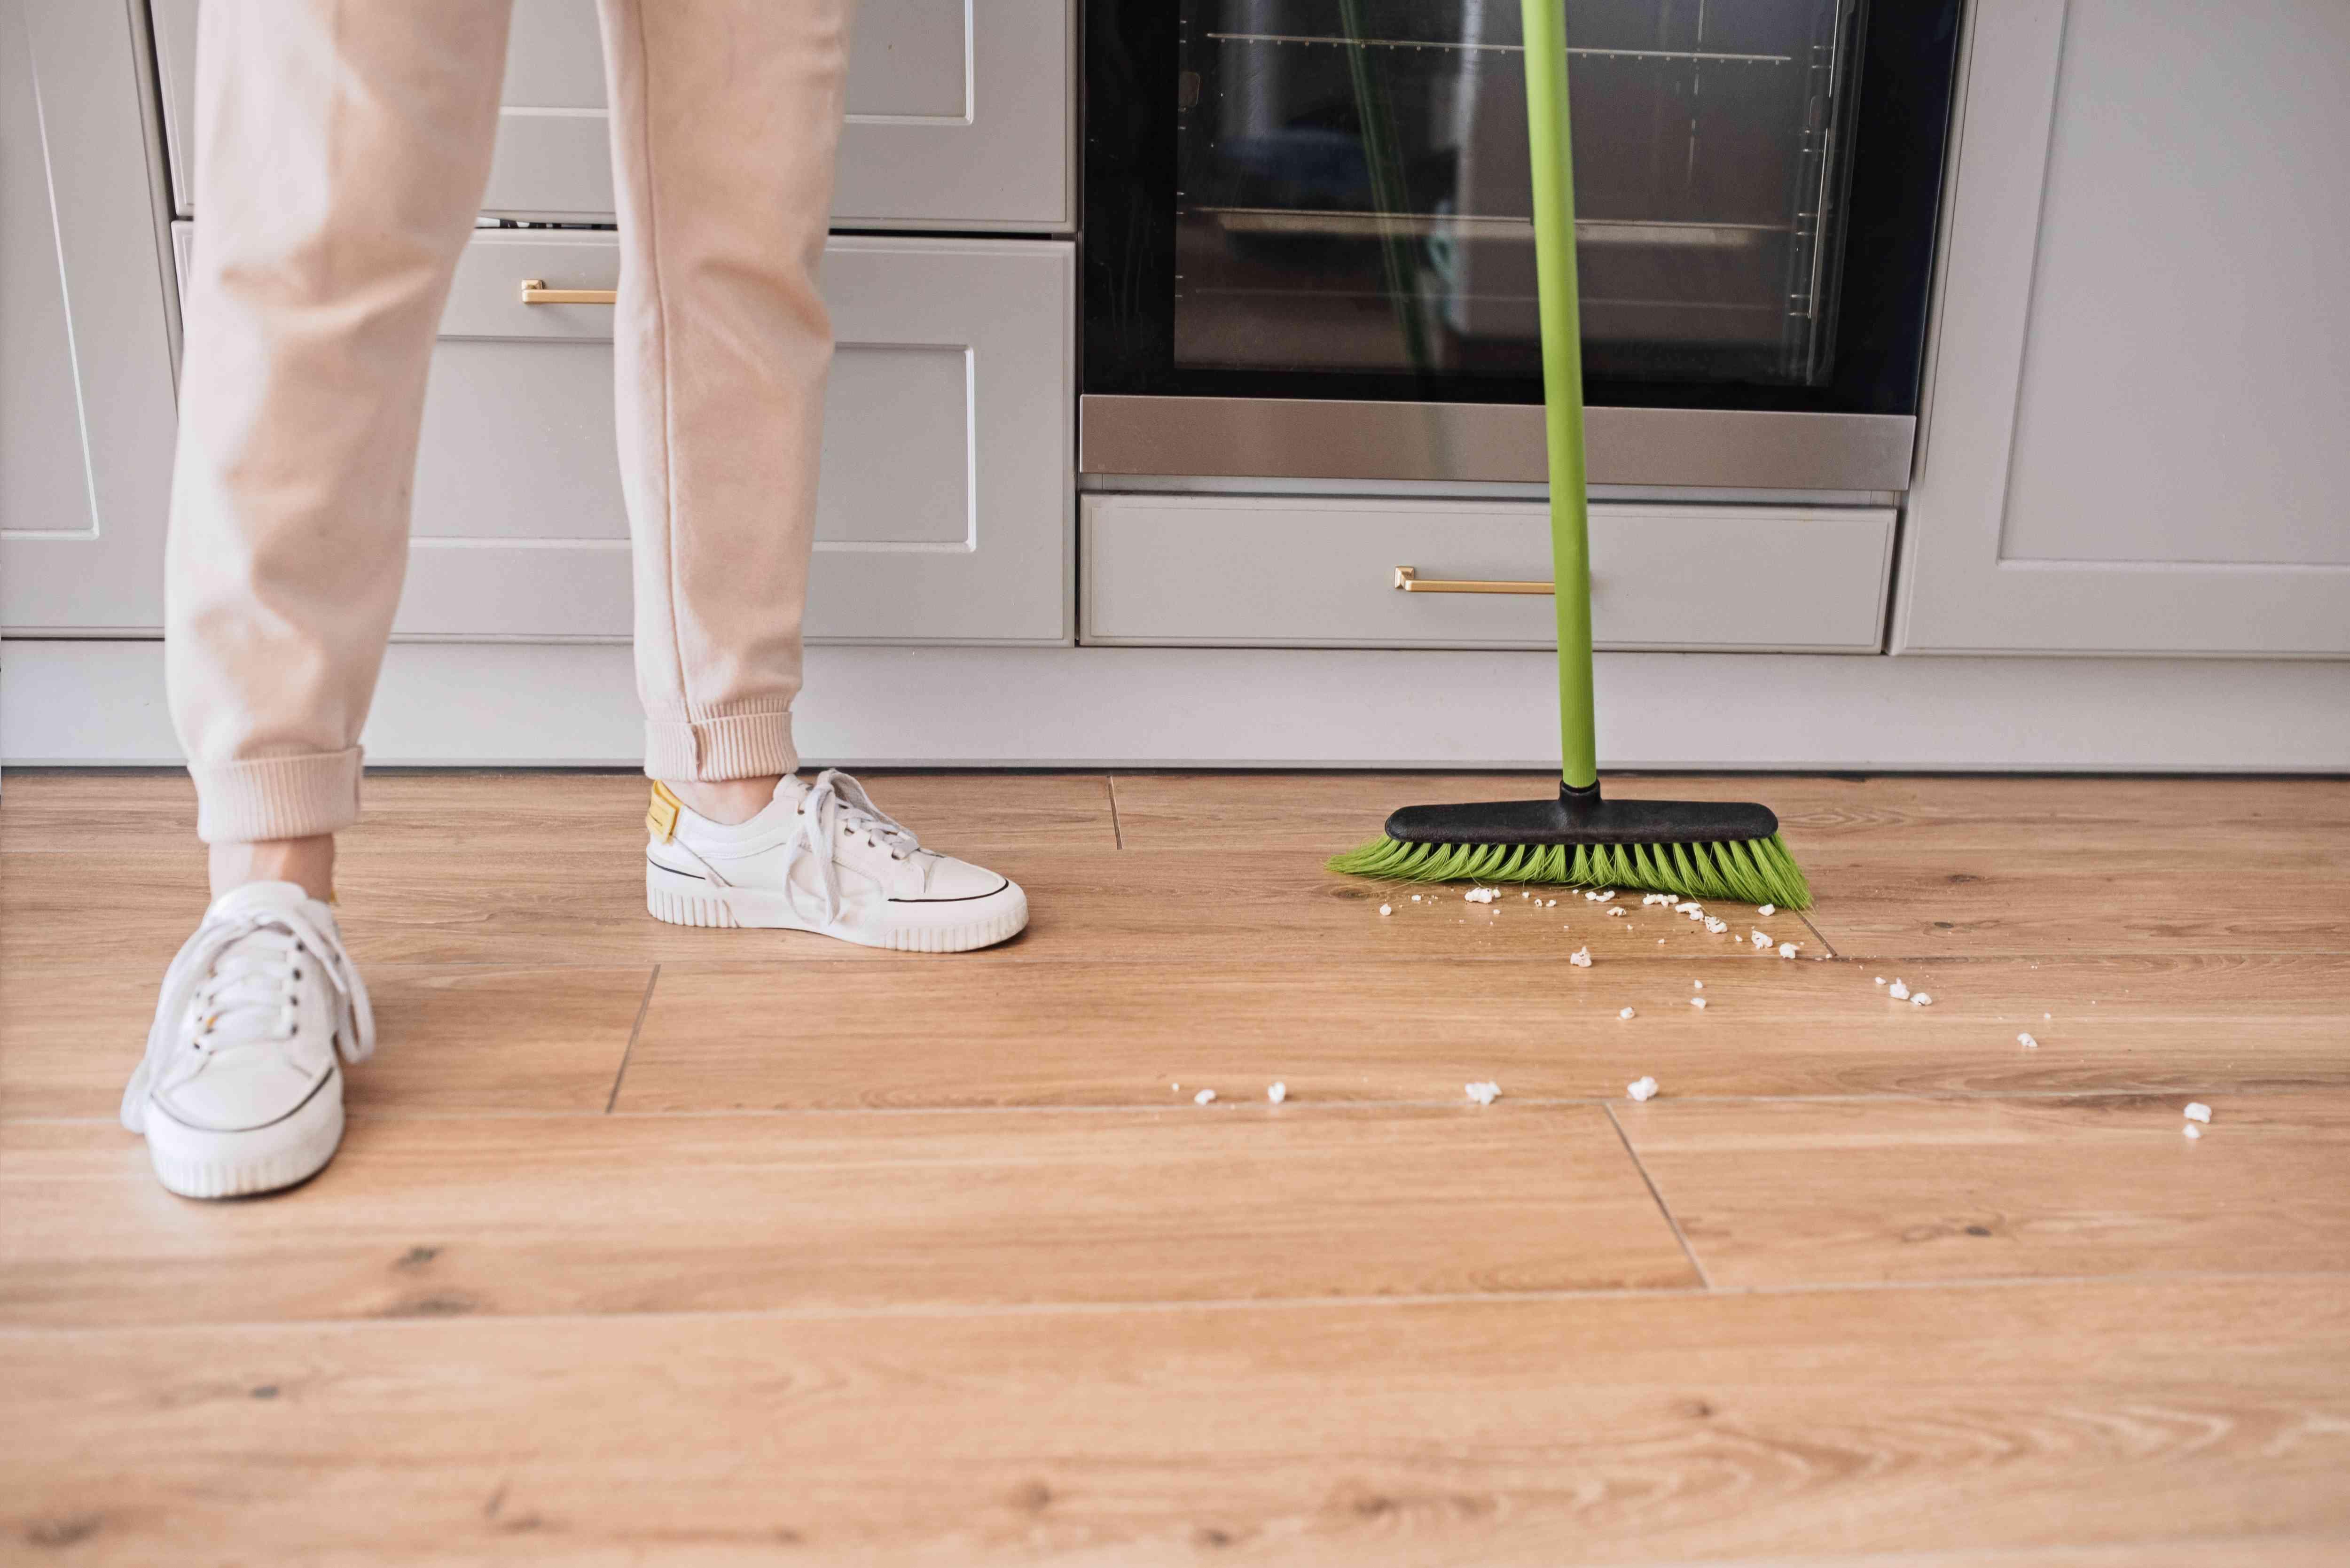 Green broom sweeping white debris on wooden floor